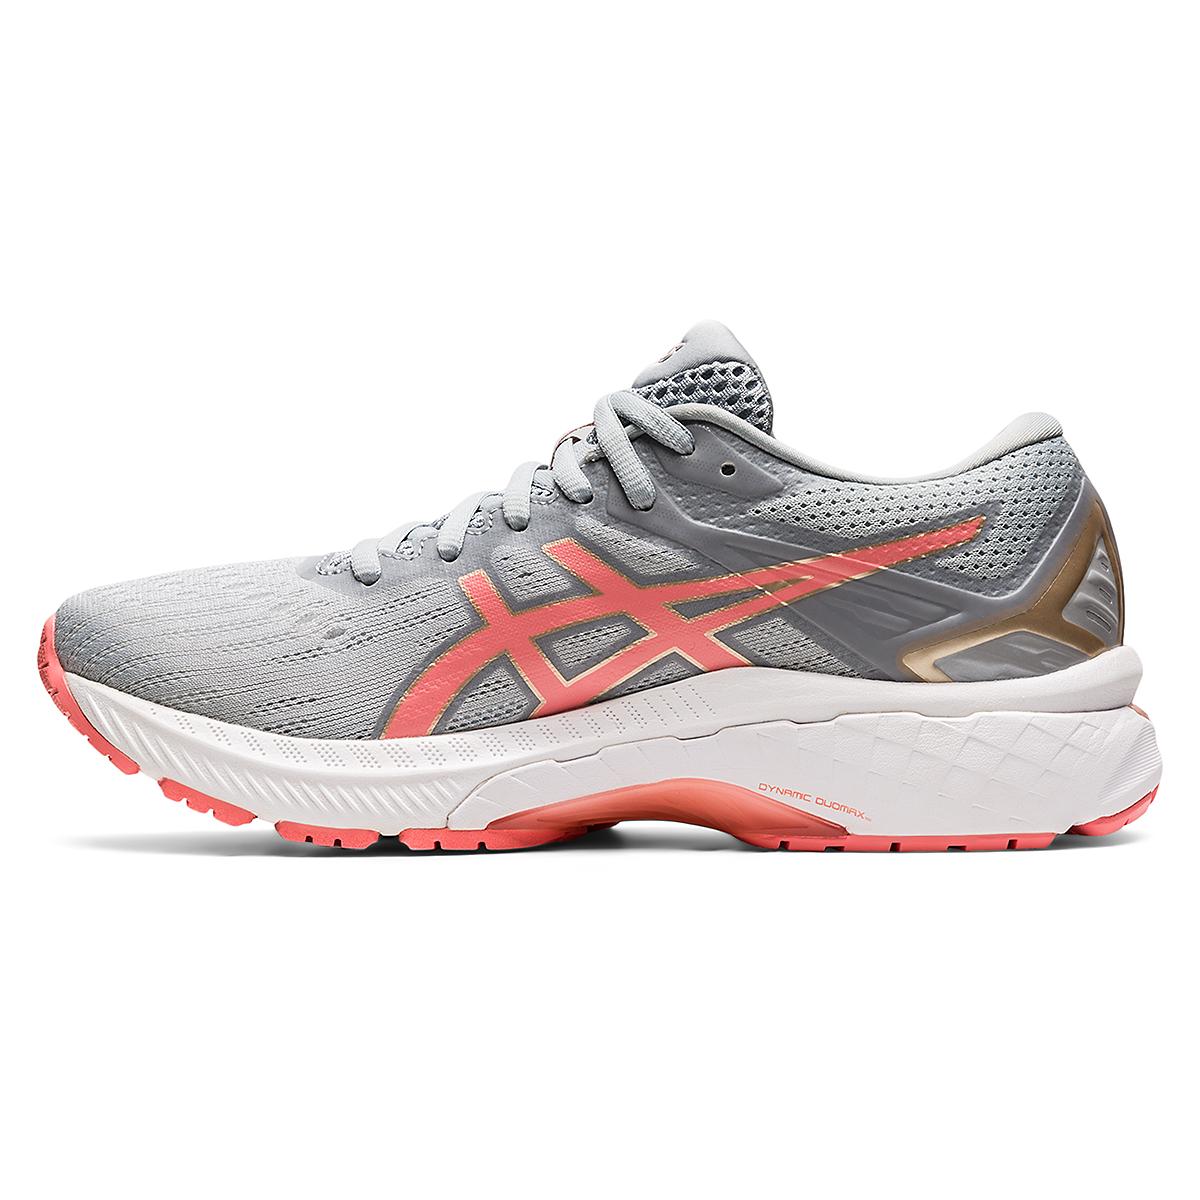 Women's Asics Gt-2000 9 Running Shoe - Color: Piedmont Grey - Size: 5 - Width: Regular, Piedmont Grey, large, image 2